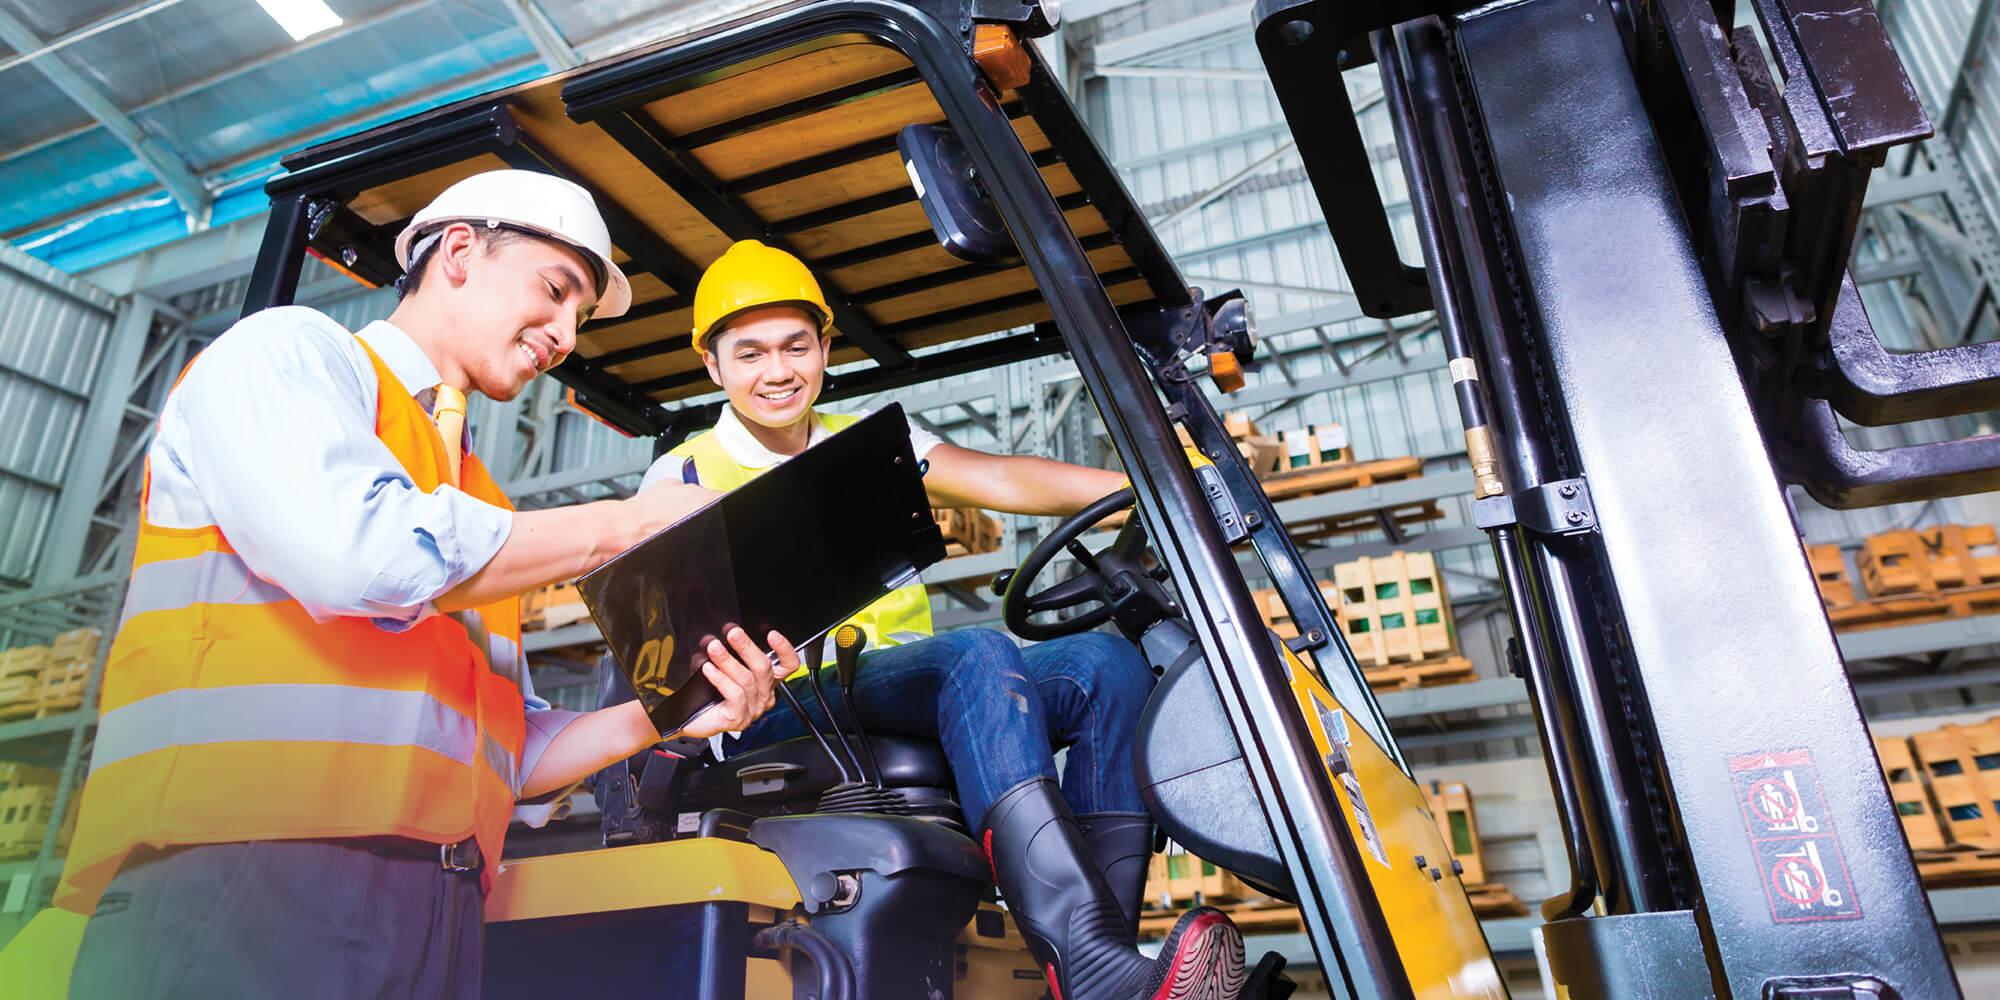 WMS Warehousing Management Logistics Workers